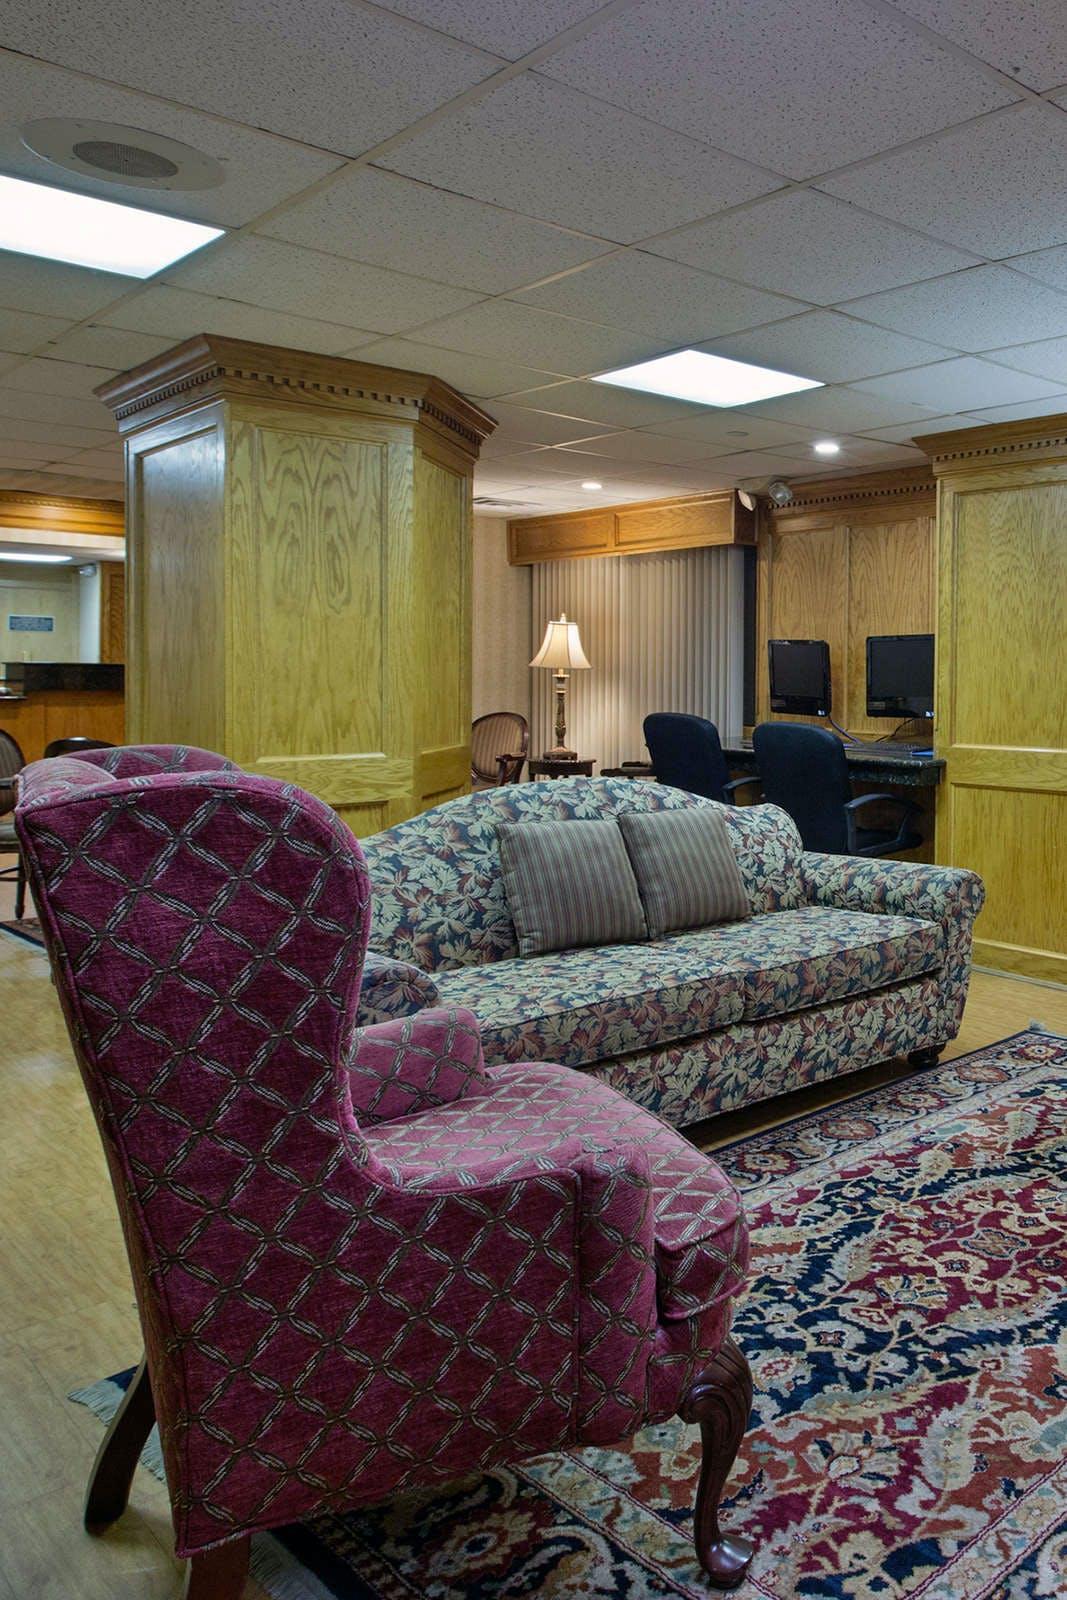 Country Inn & Suites by Radisson, Williamsburg East (Busch Gardens), VA